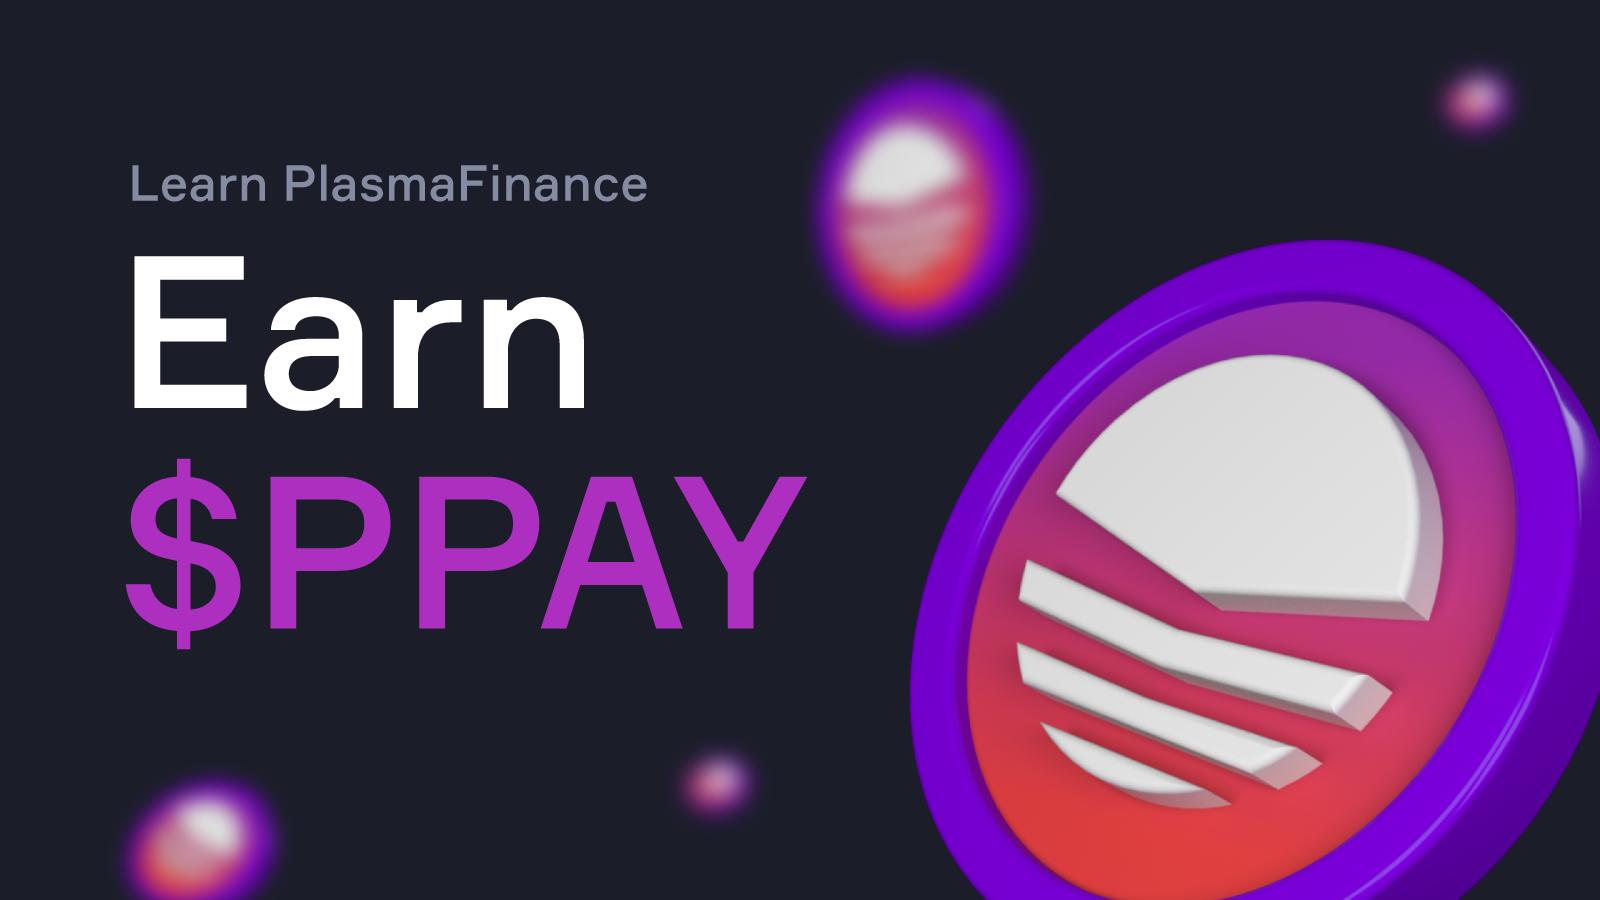 Learn about PlasmaFinance & Earn PPAY Tokens